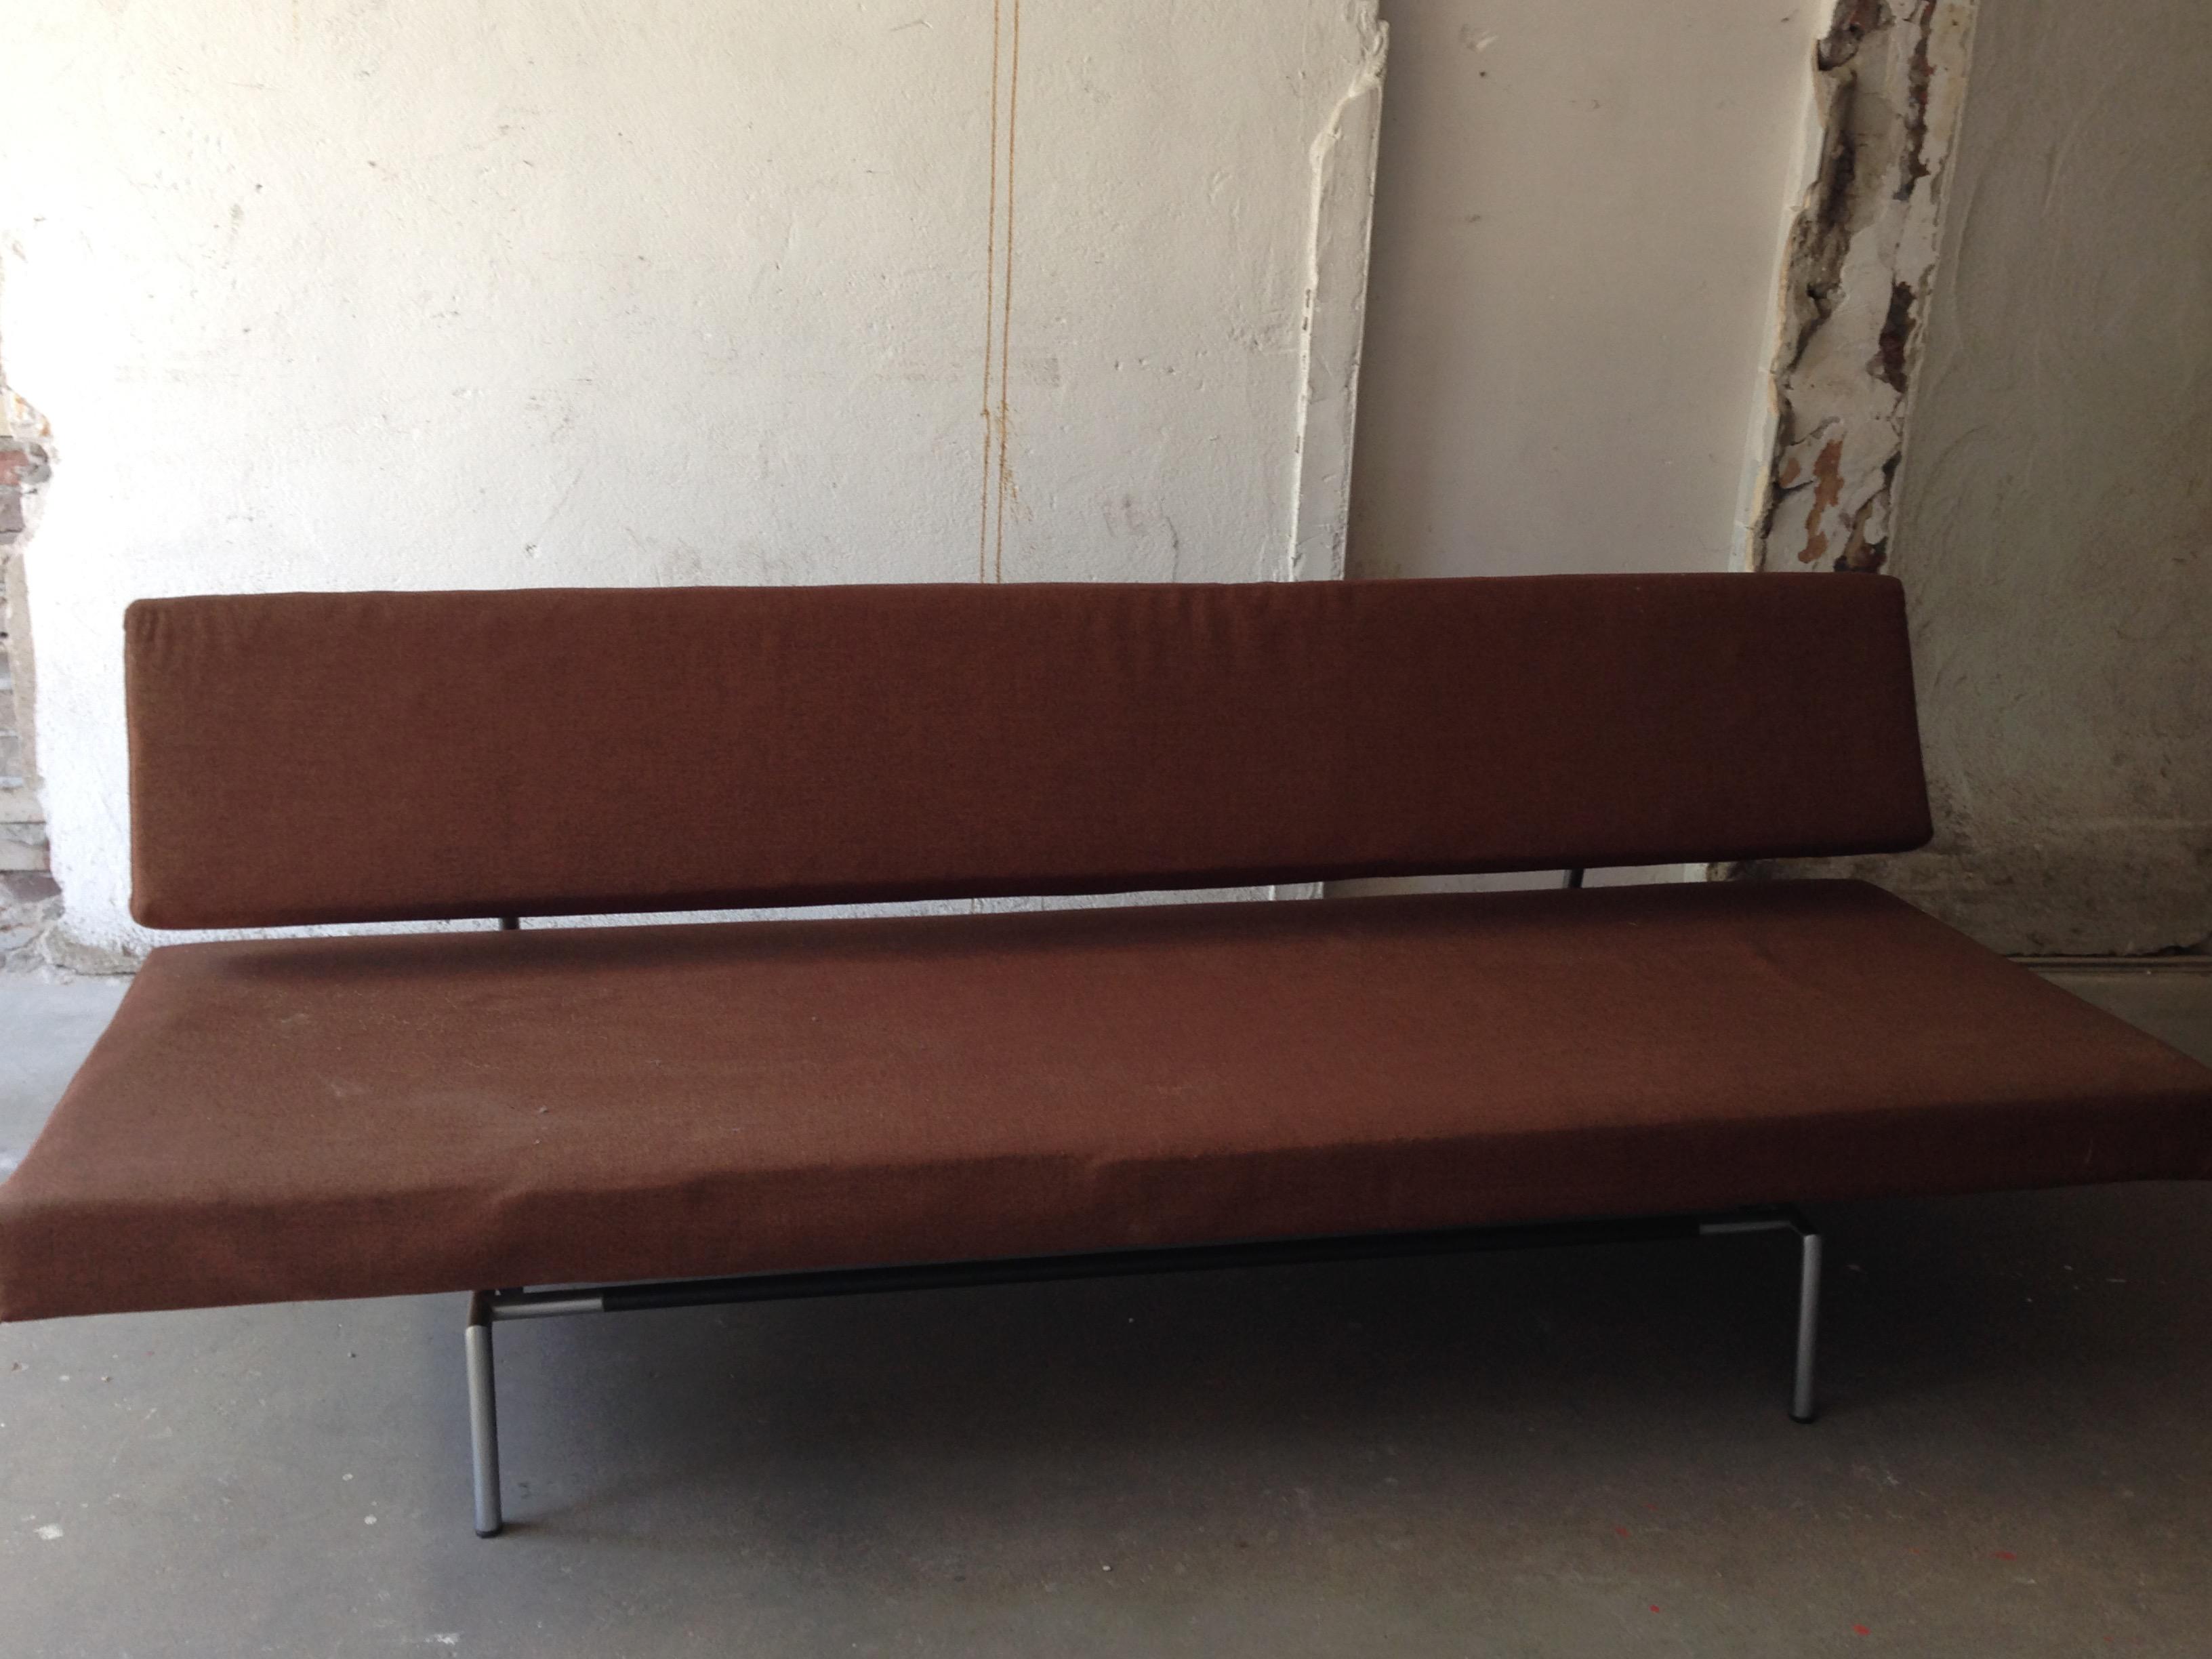 SOLD - Spectrum (Sleep) Sofa. Designed by Martin Visser in 1960. - SOLD